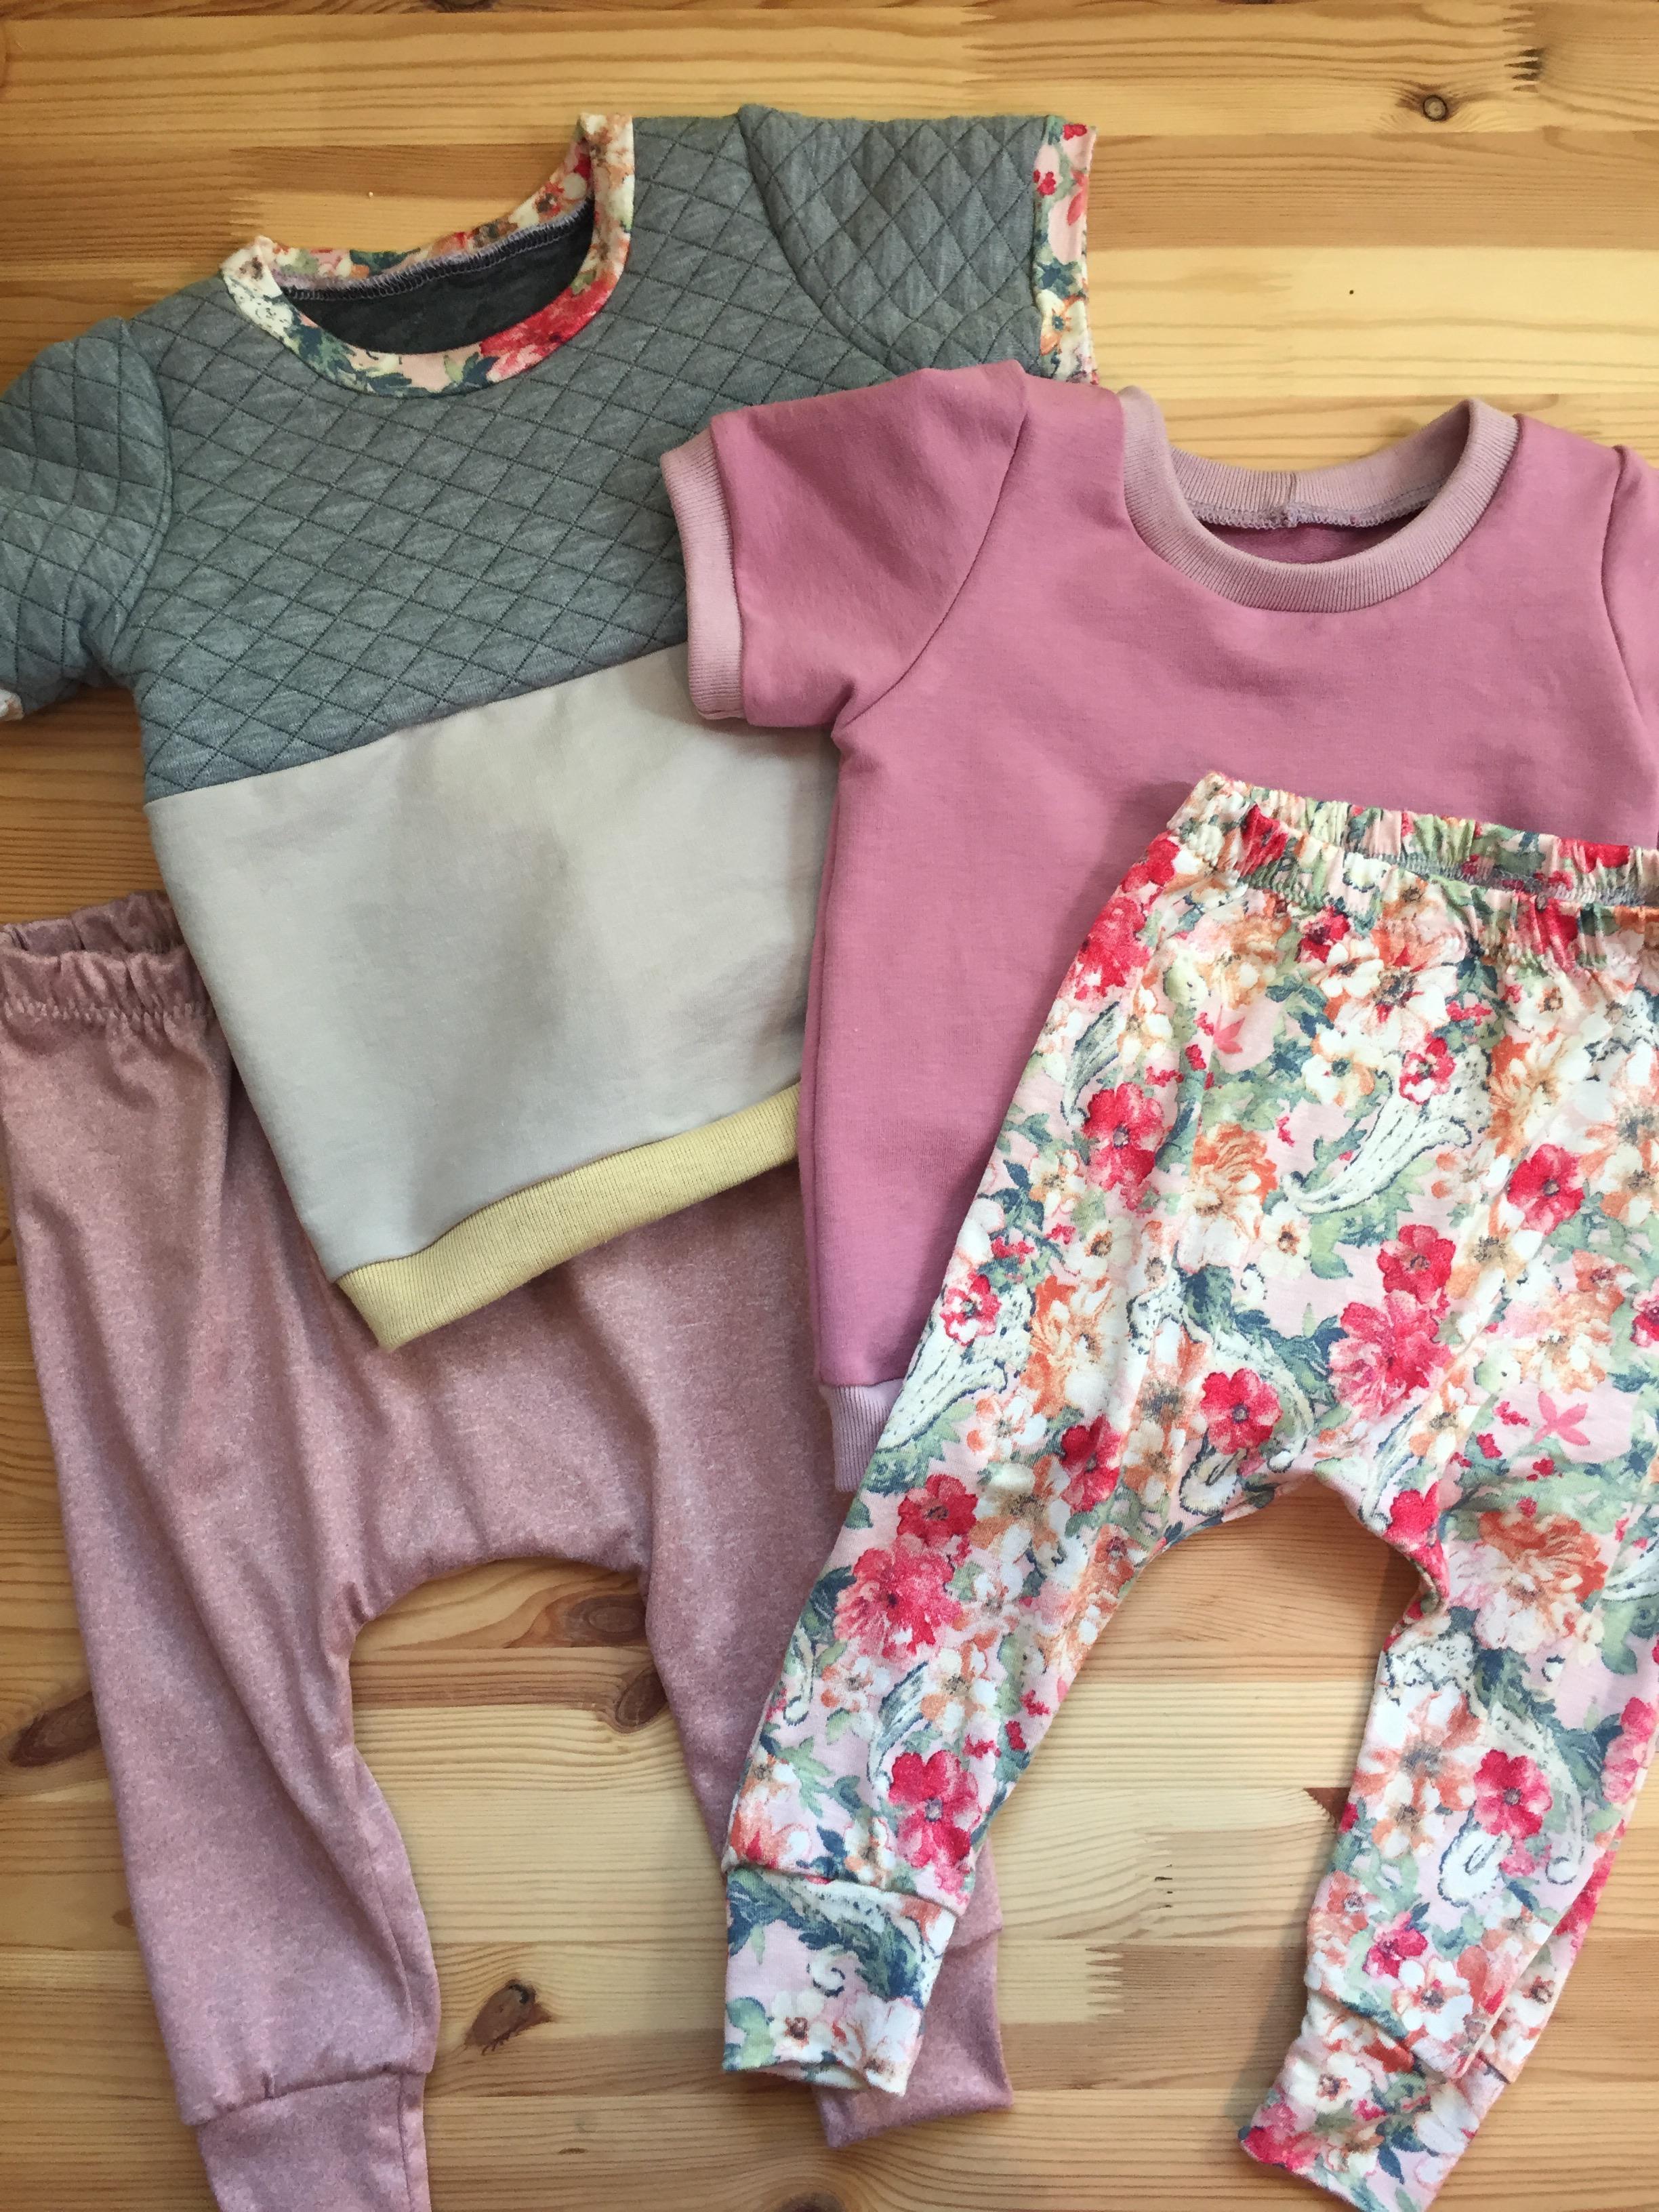 Brindle And Twig Patterns : brindle, patterns, Outfits, Little, Brindille, Patterns:, Super, Harem, Pants, Ringer, Assorted, Stash, Fabrics., Wardrobe, Sewing